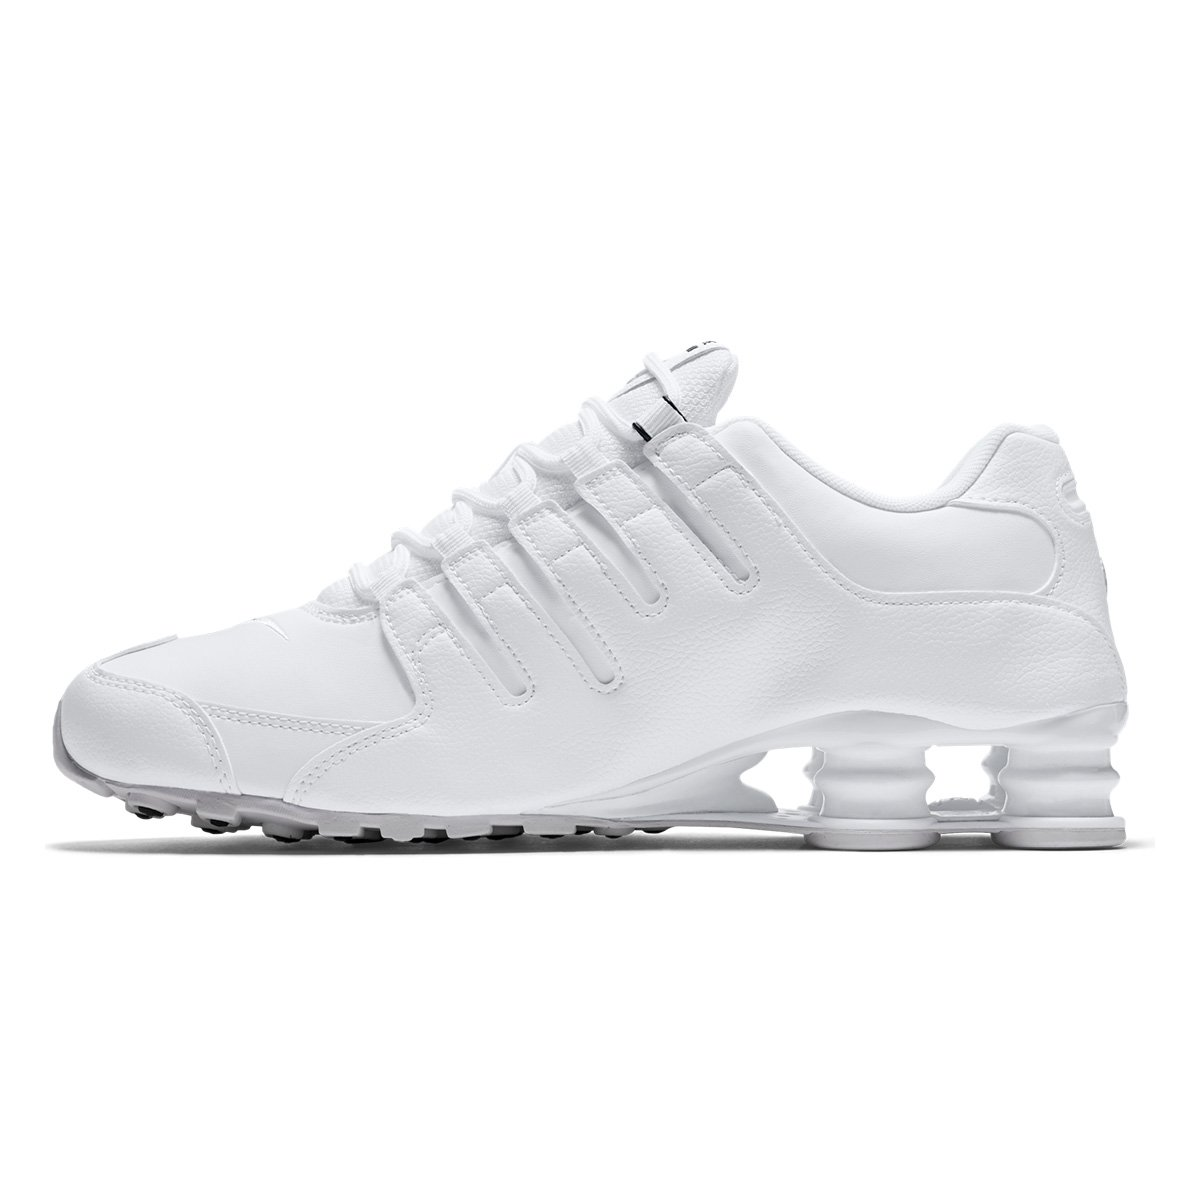 c9fb1f2afd Tênis Nike Shox Nz Eu Masculino - Branco - Compre Agora